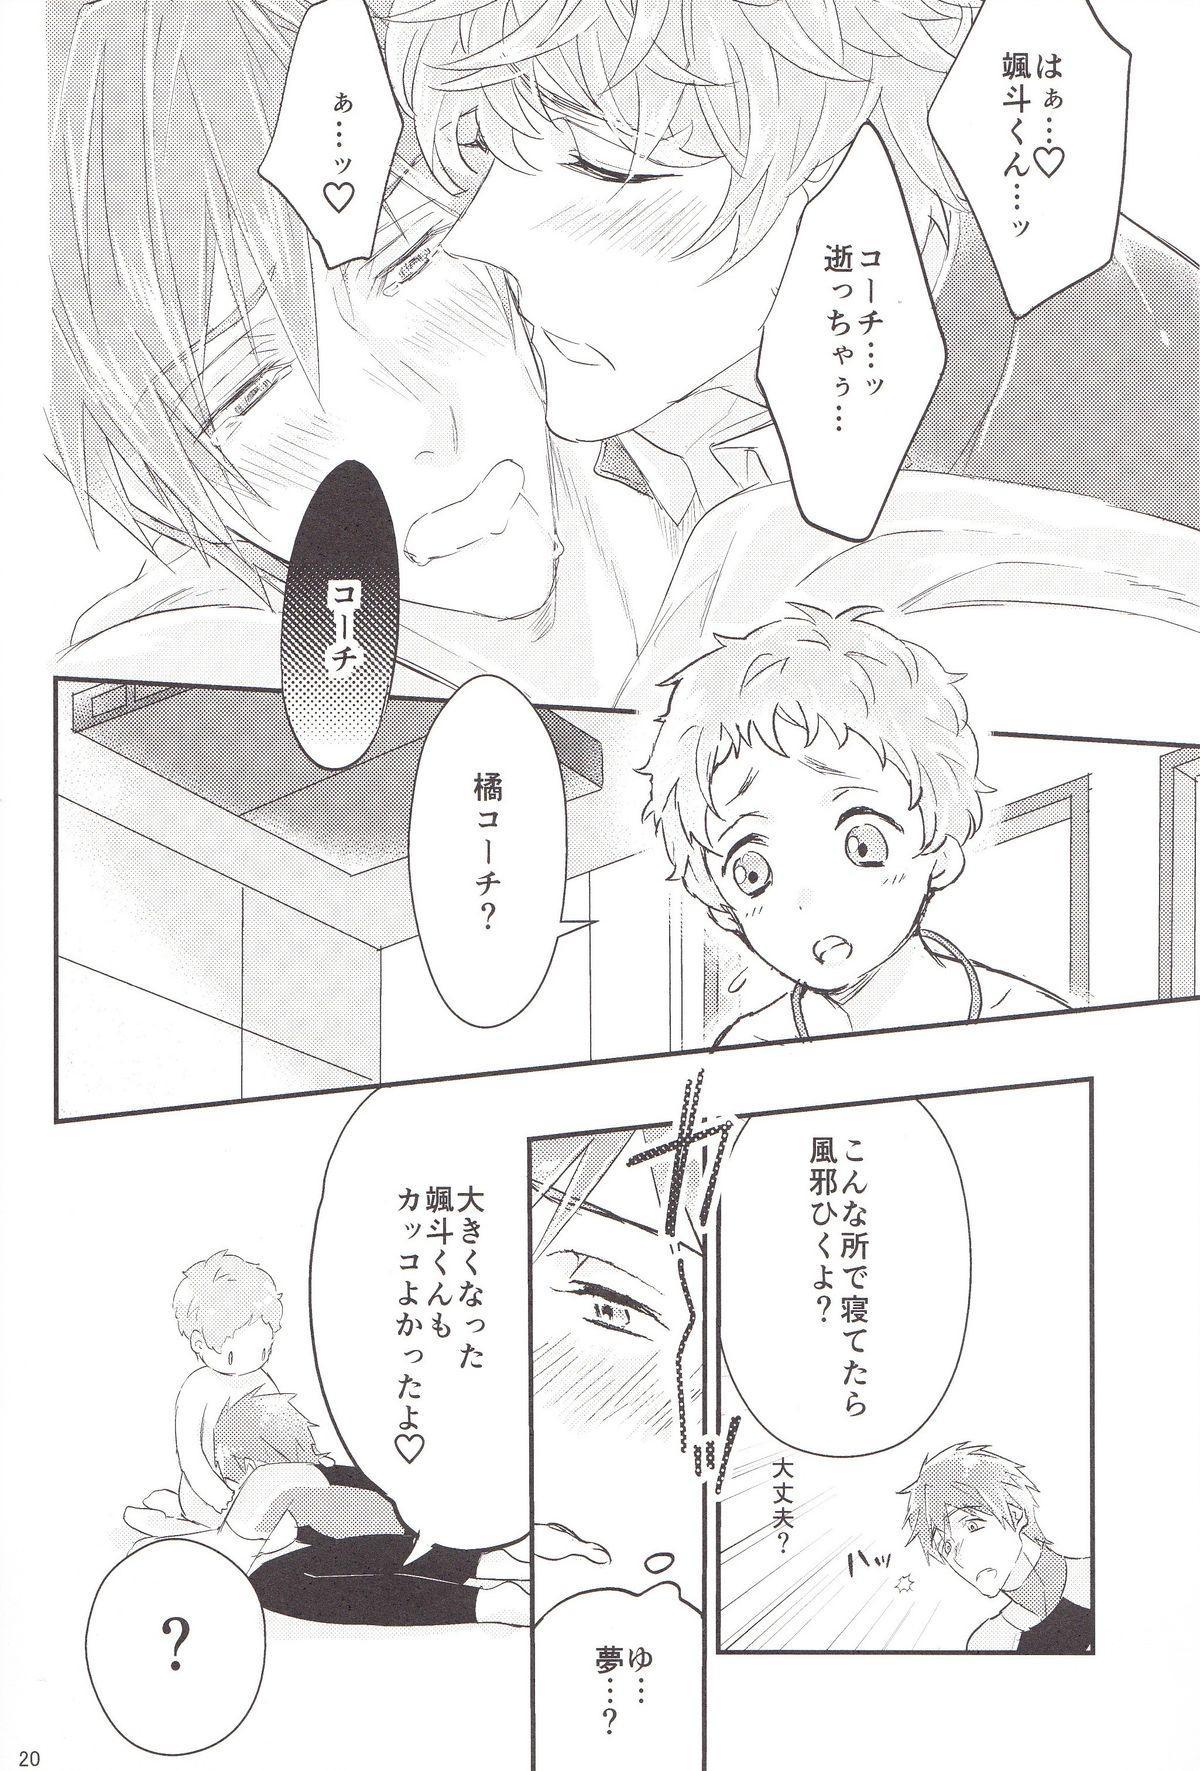 Tachibana Coach no Kojin Lesson 18